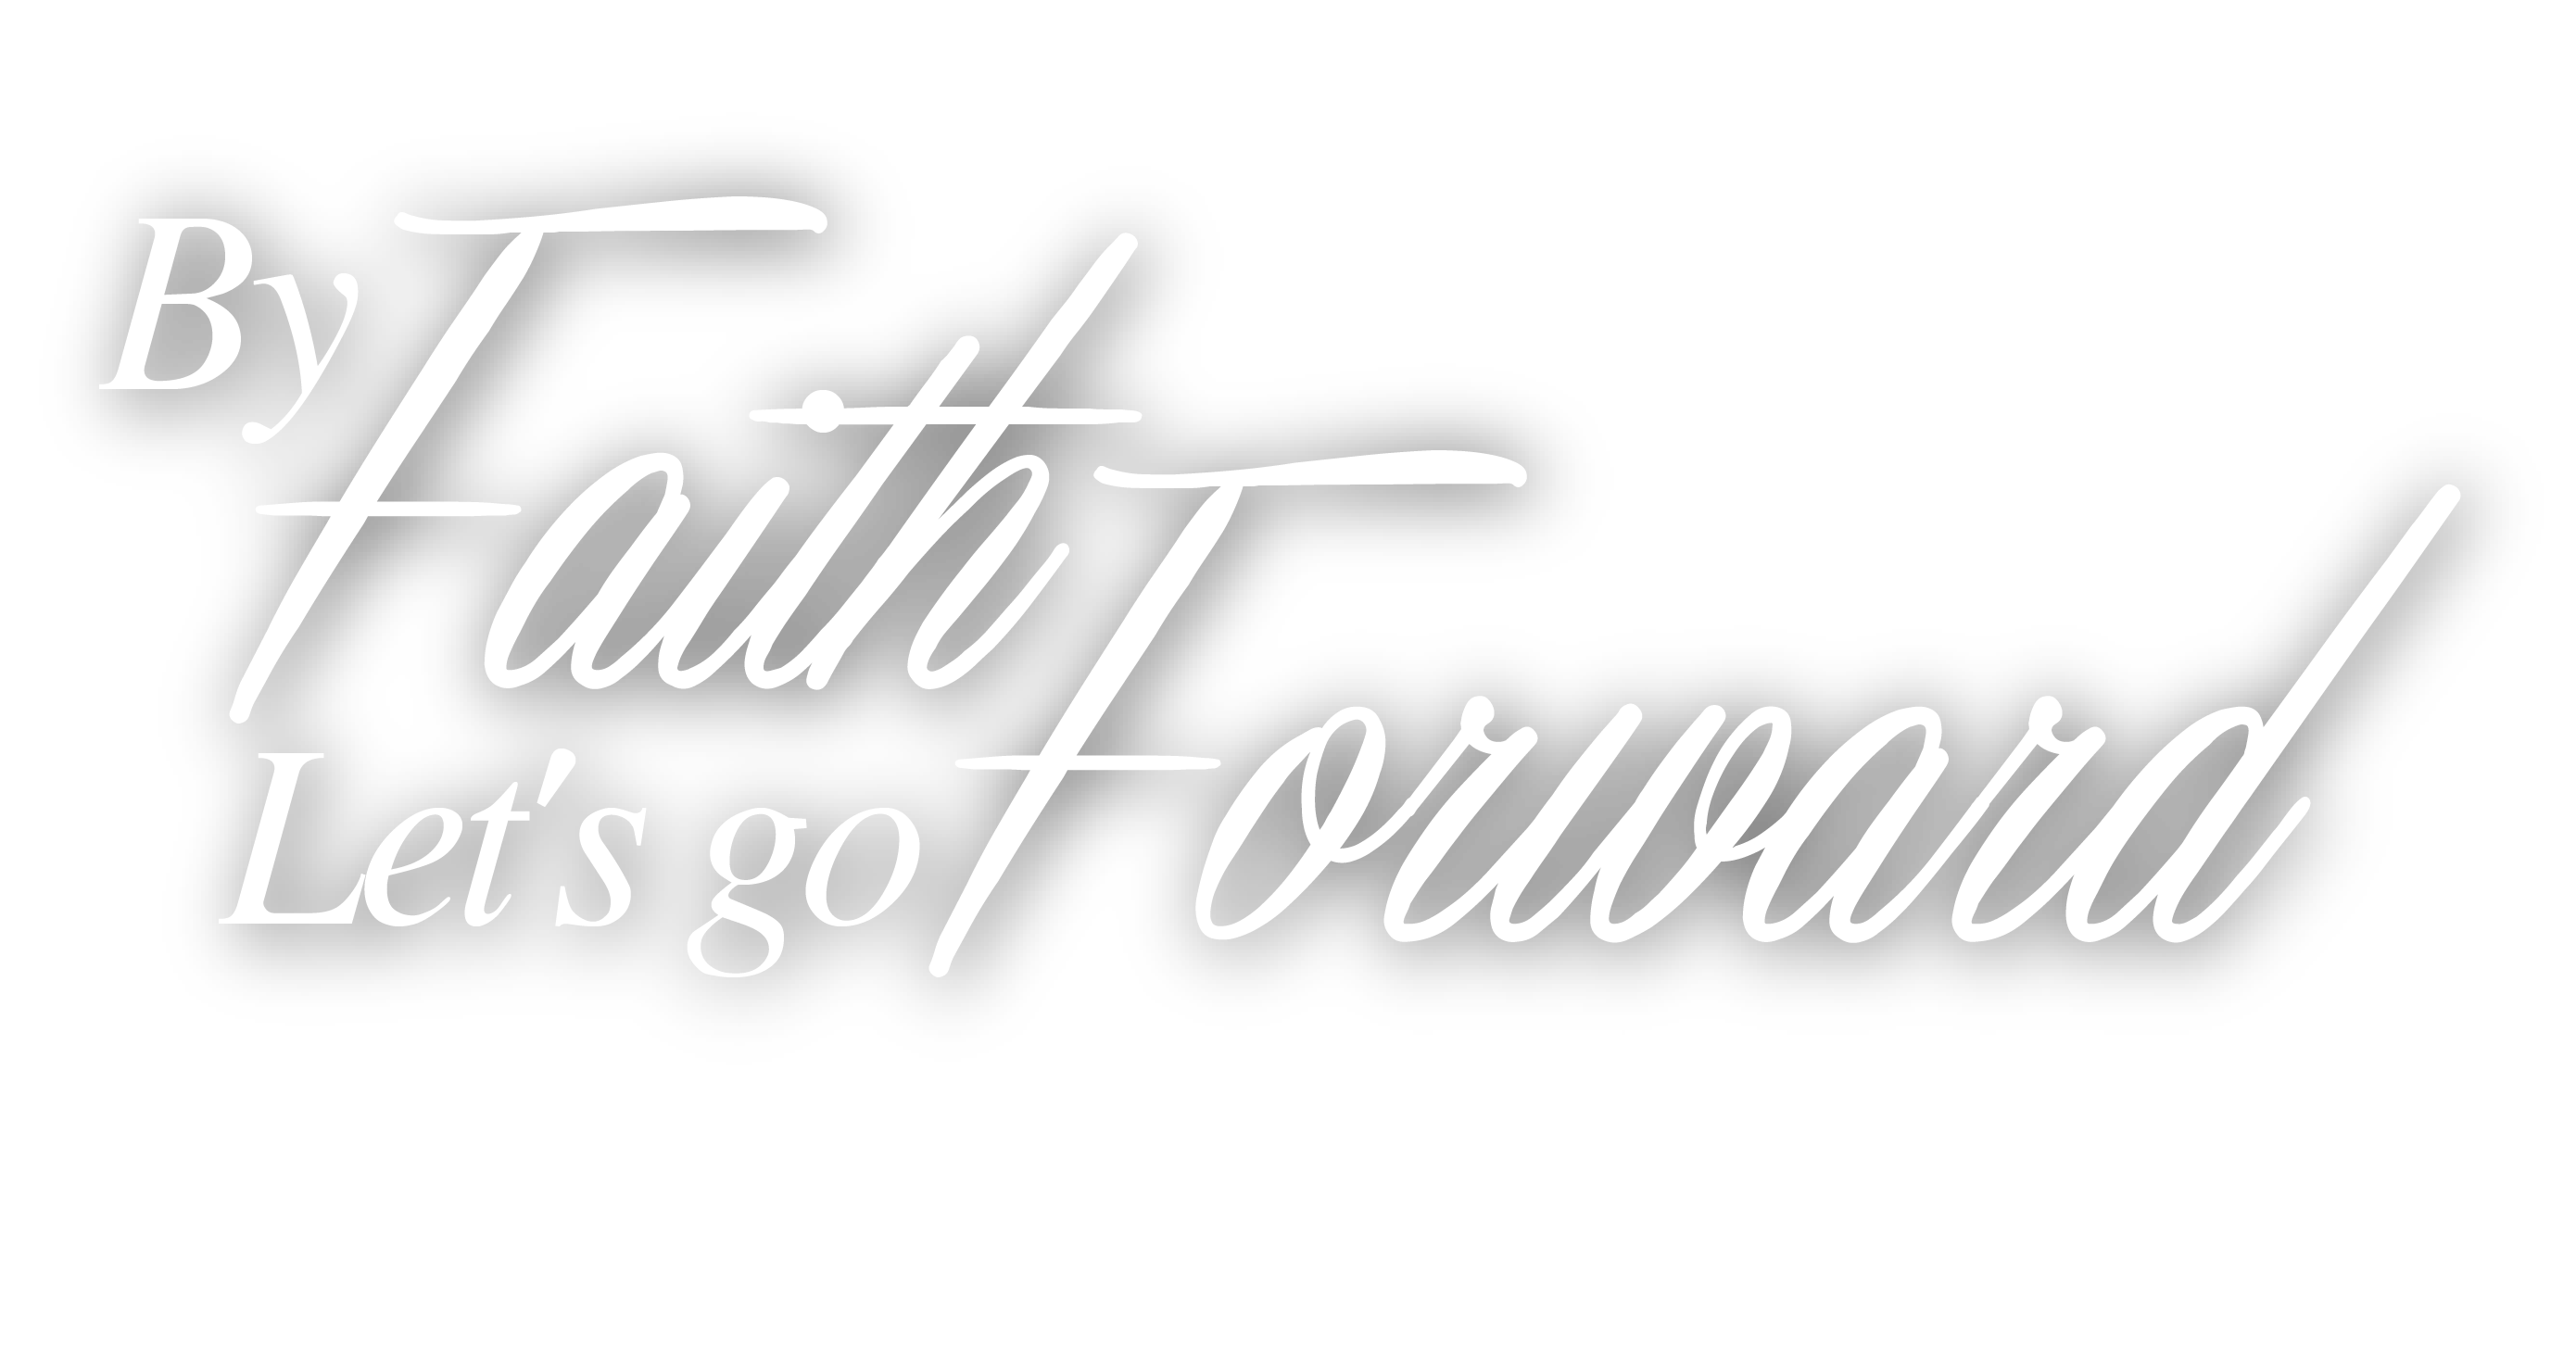 byfaithwegoforward